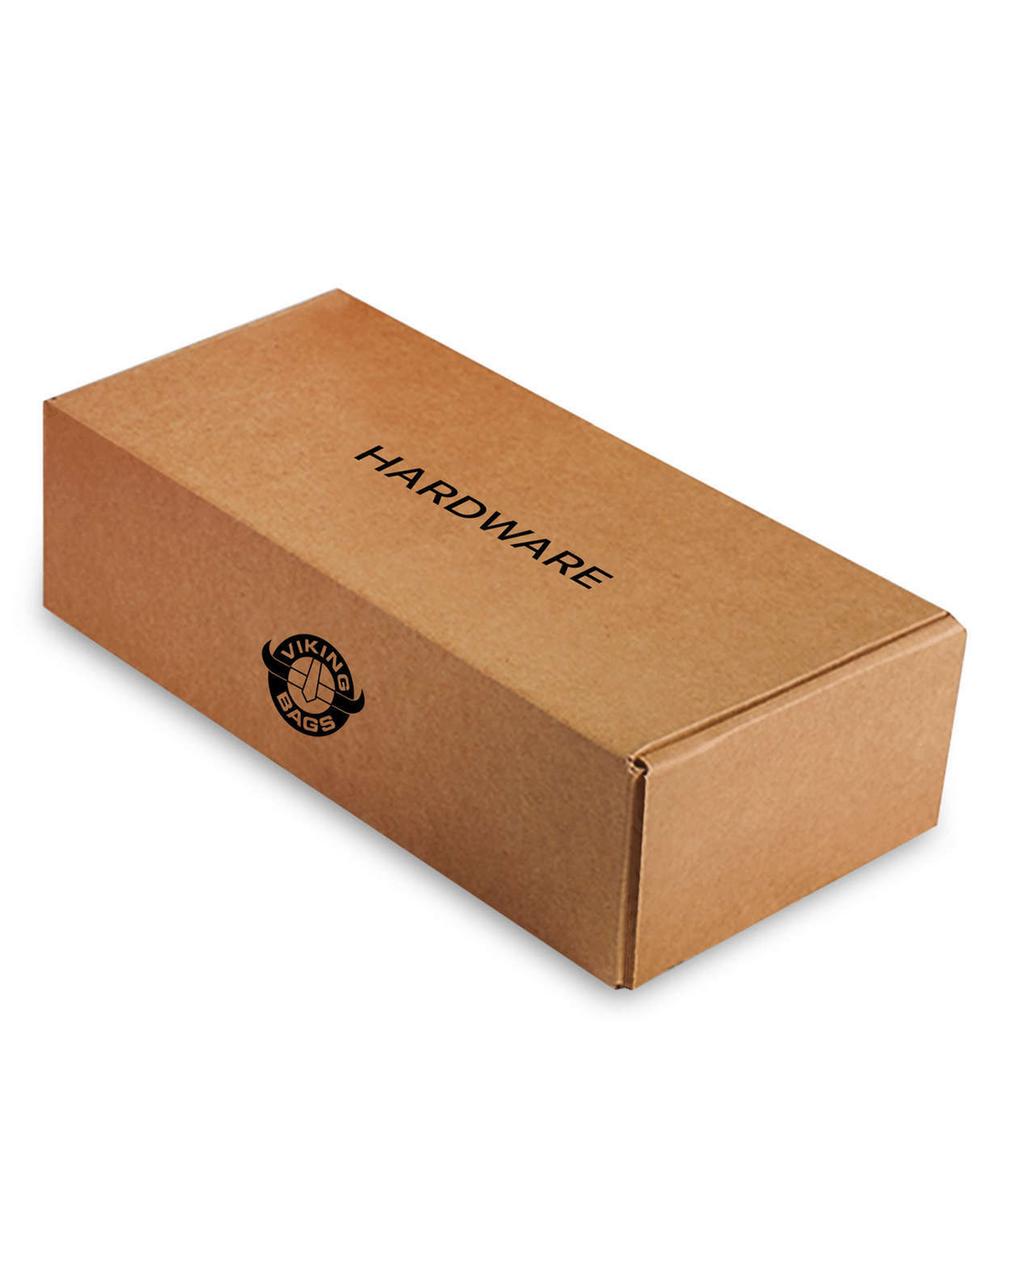 Honda 1500 Valkyrie Standard Charger Single Strap Studded Medium Motorcycle Saddlebags Box